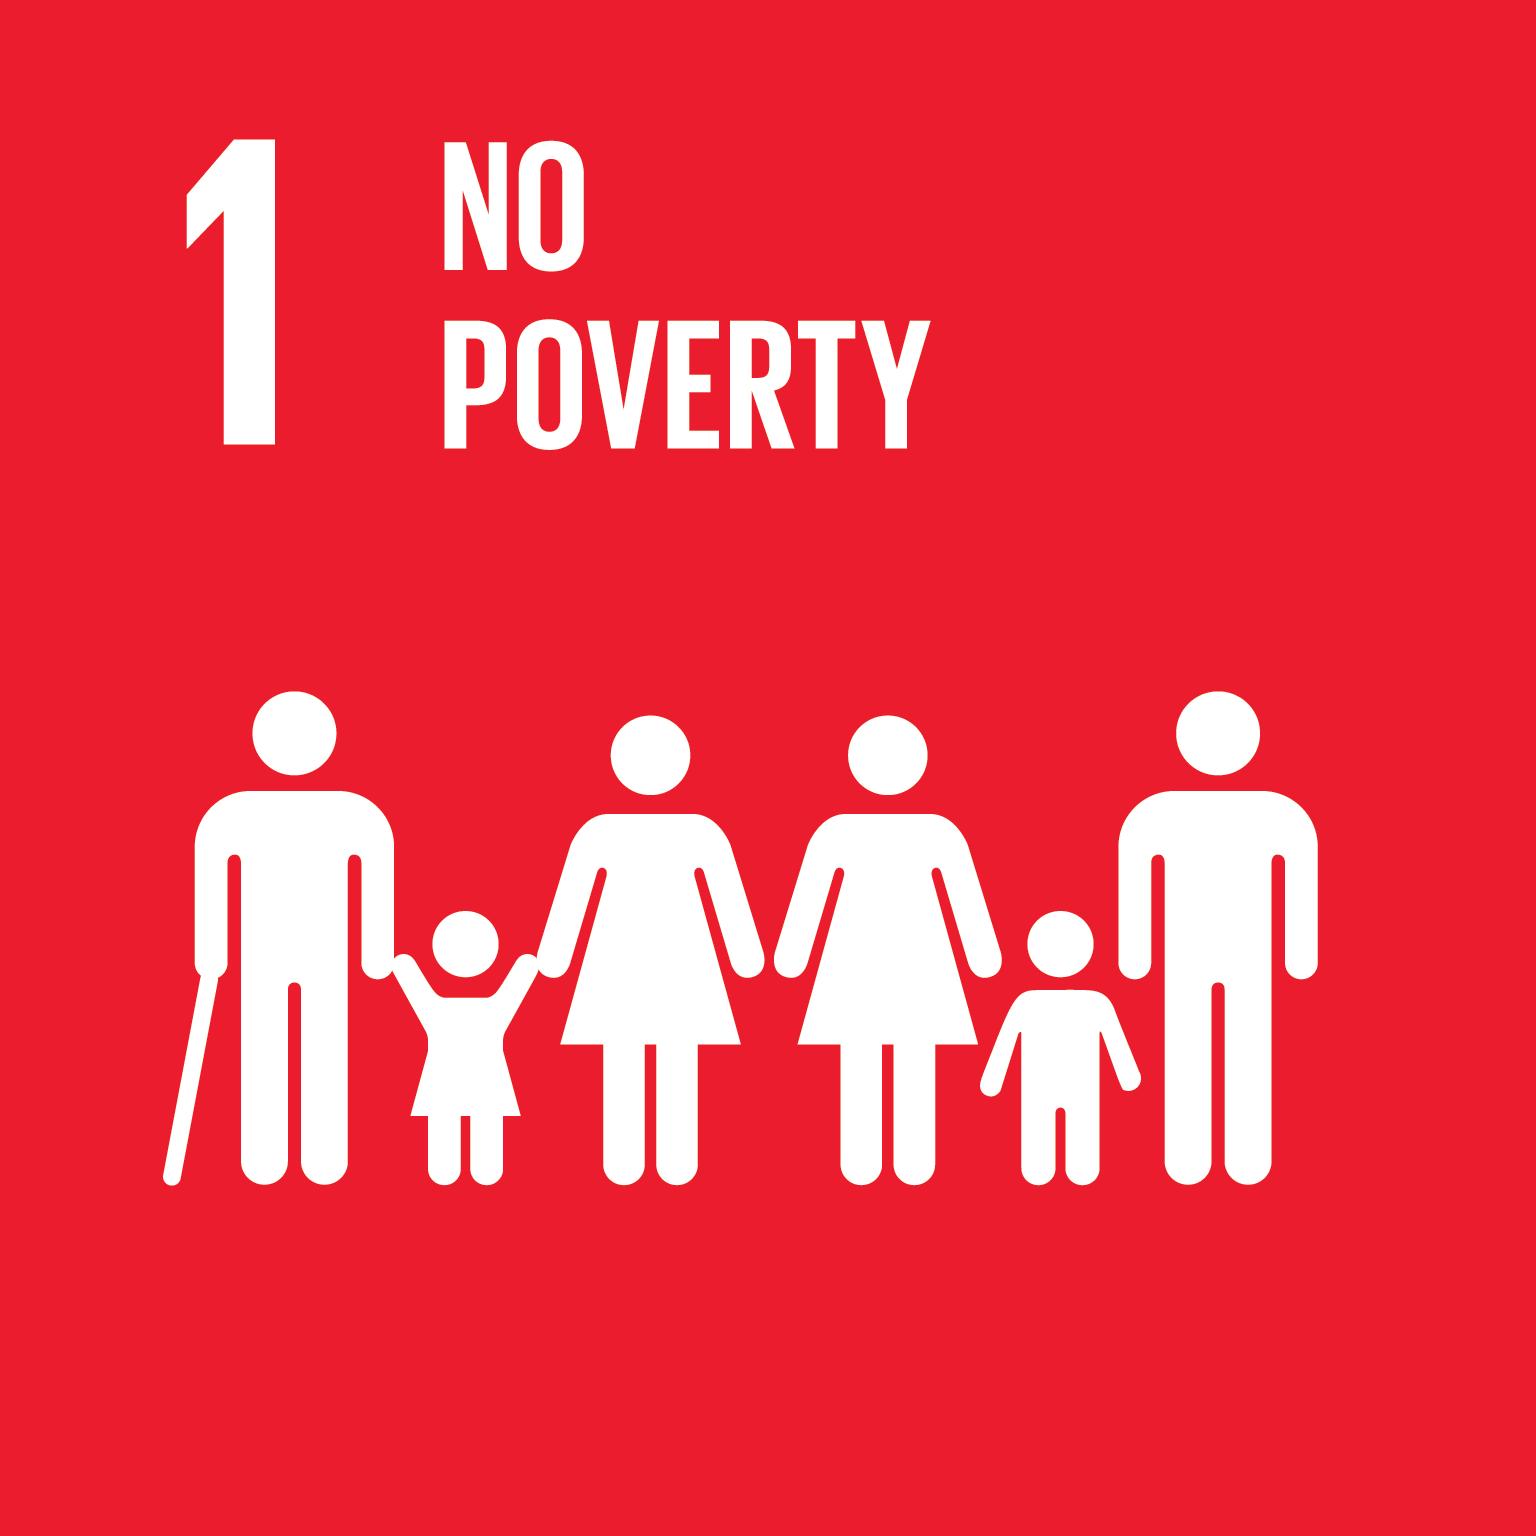 SDG 1 no poverty icon